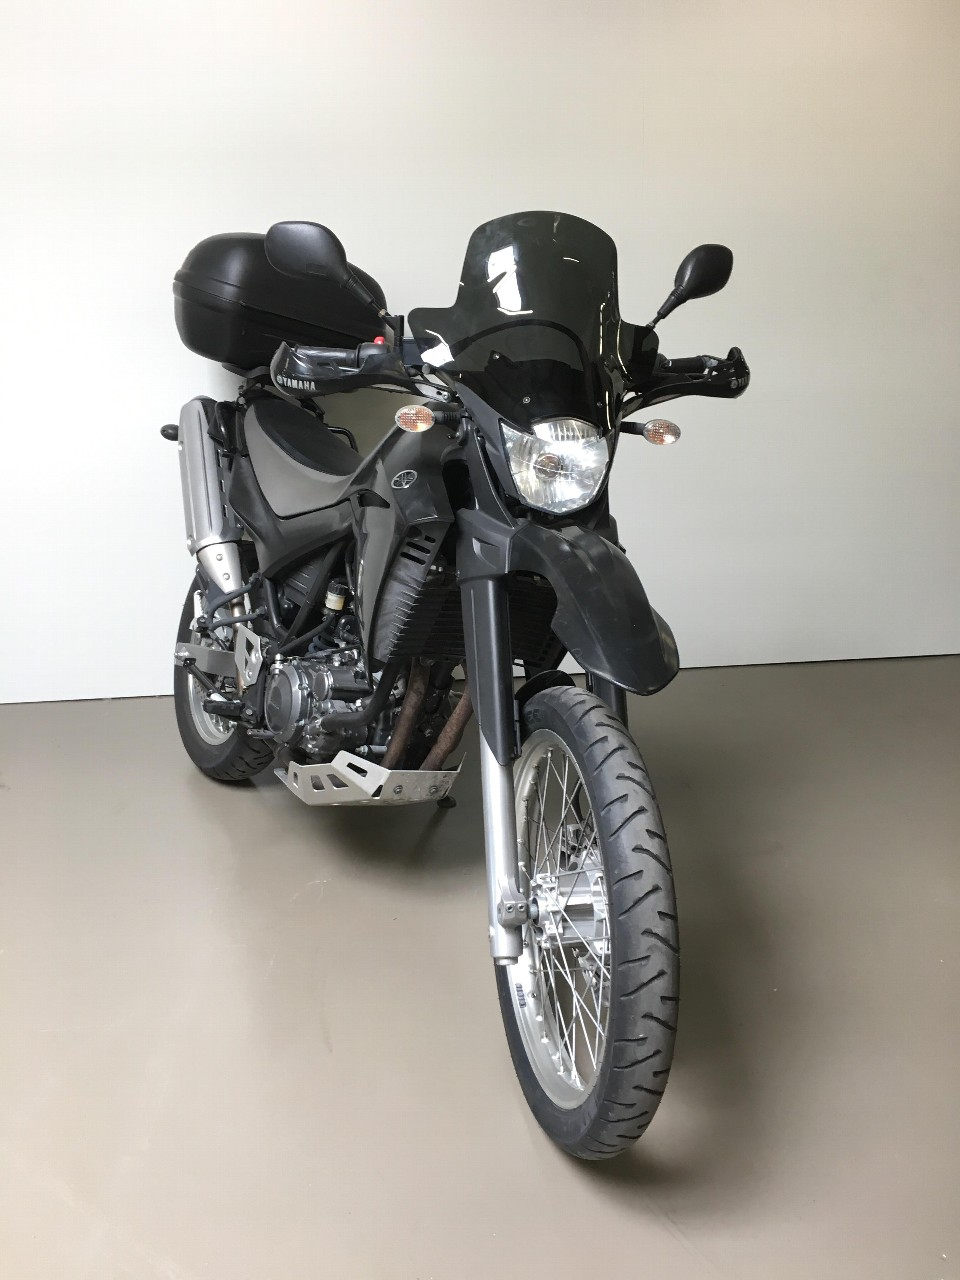 moto occasions acheter yamaha xt 660 r yamaha center sion sion. Black Bedroom Furniture Sets. Home Design Ideas